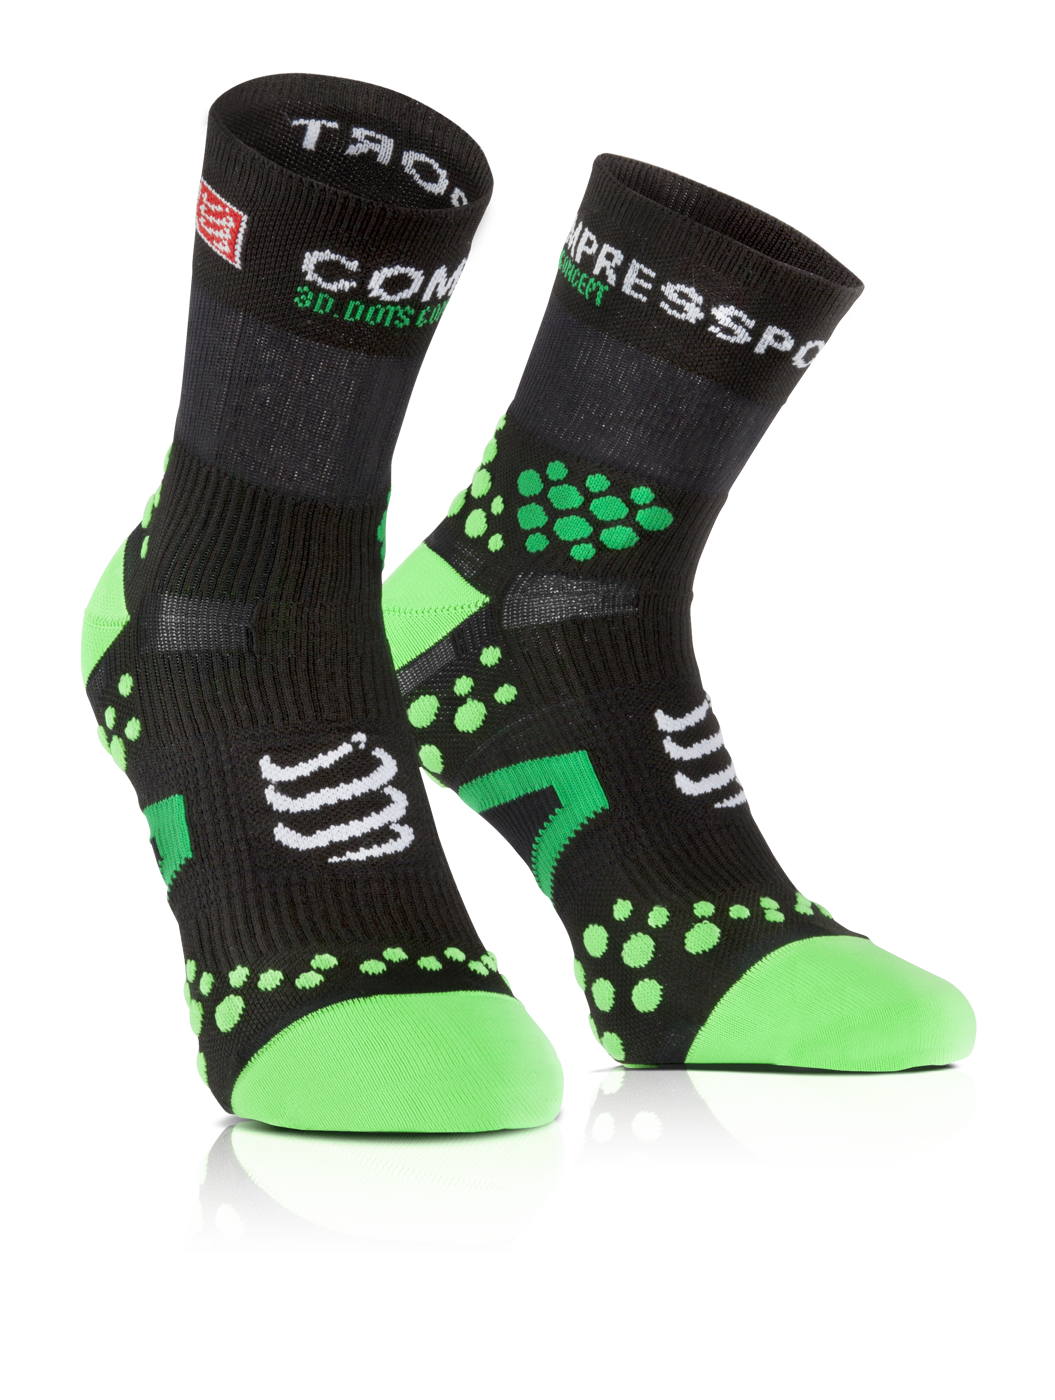 ProRacing Socks V2_1-RUN HIGH-Black-Green